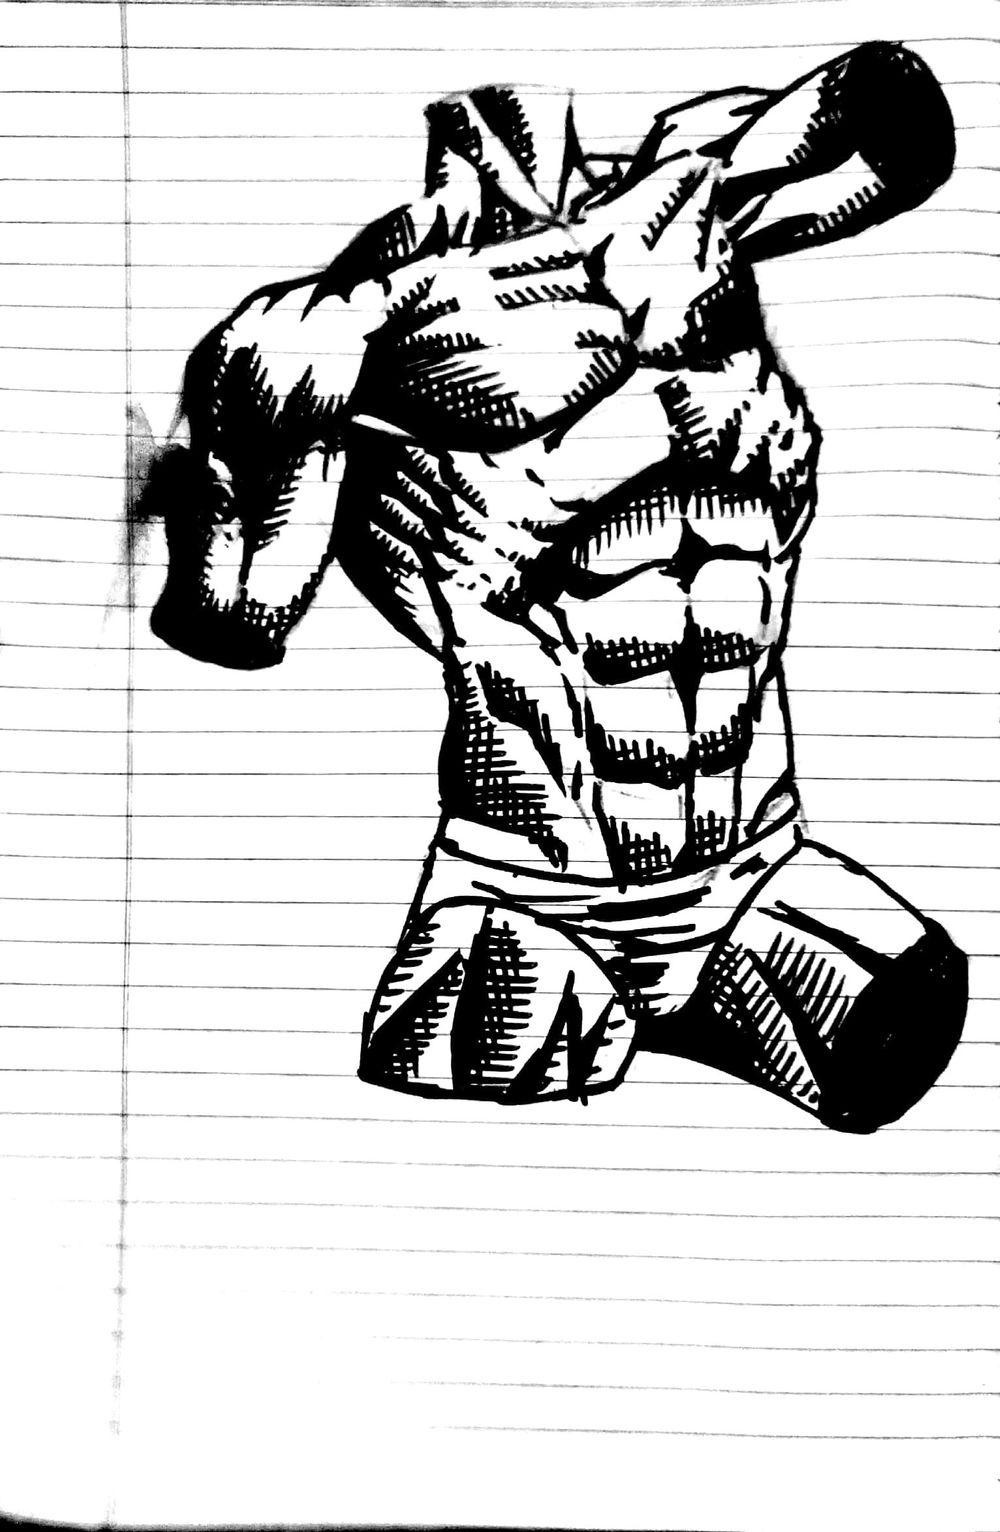 male torso - image 3 - student project